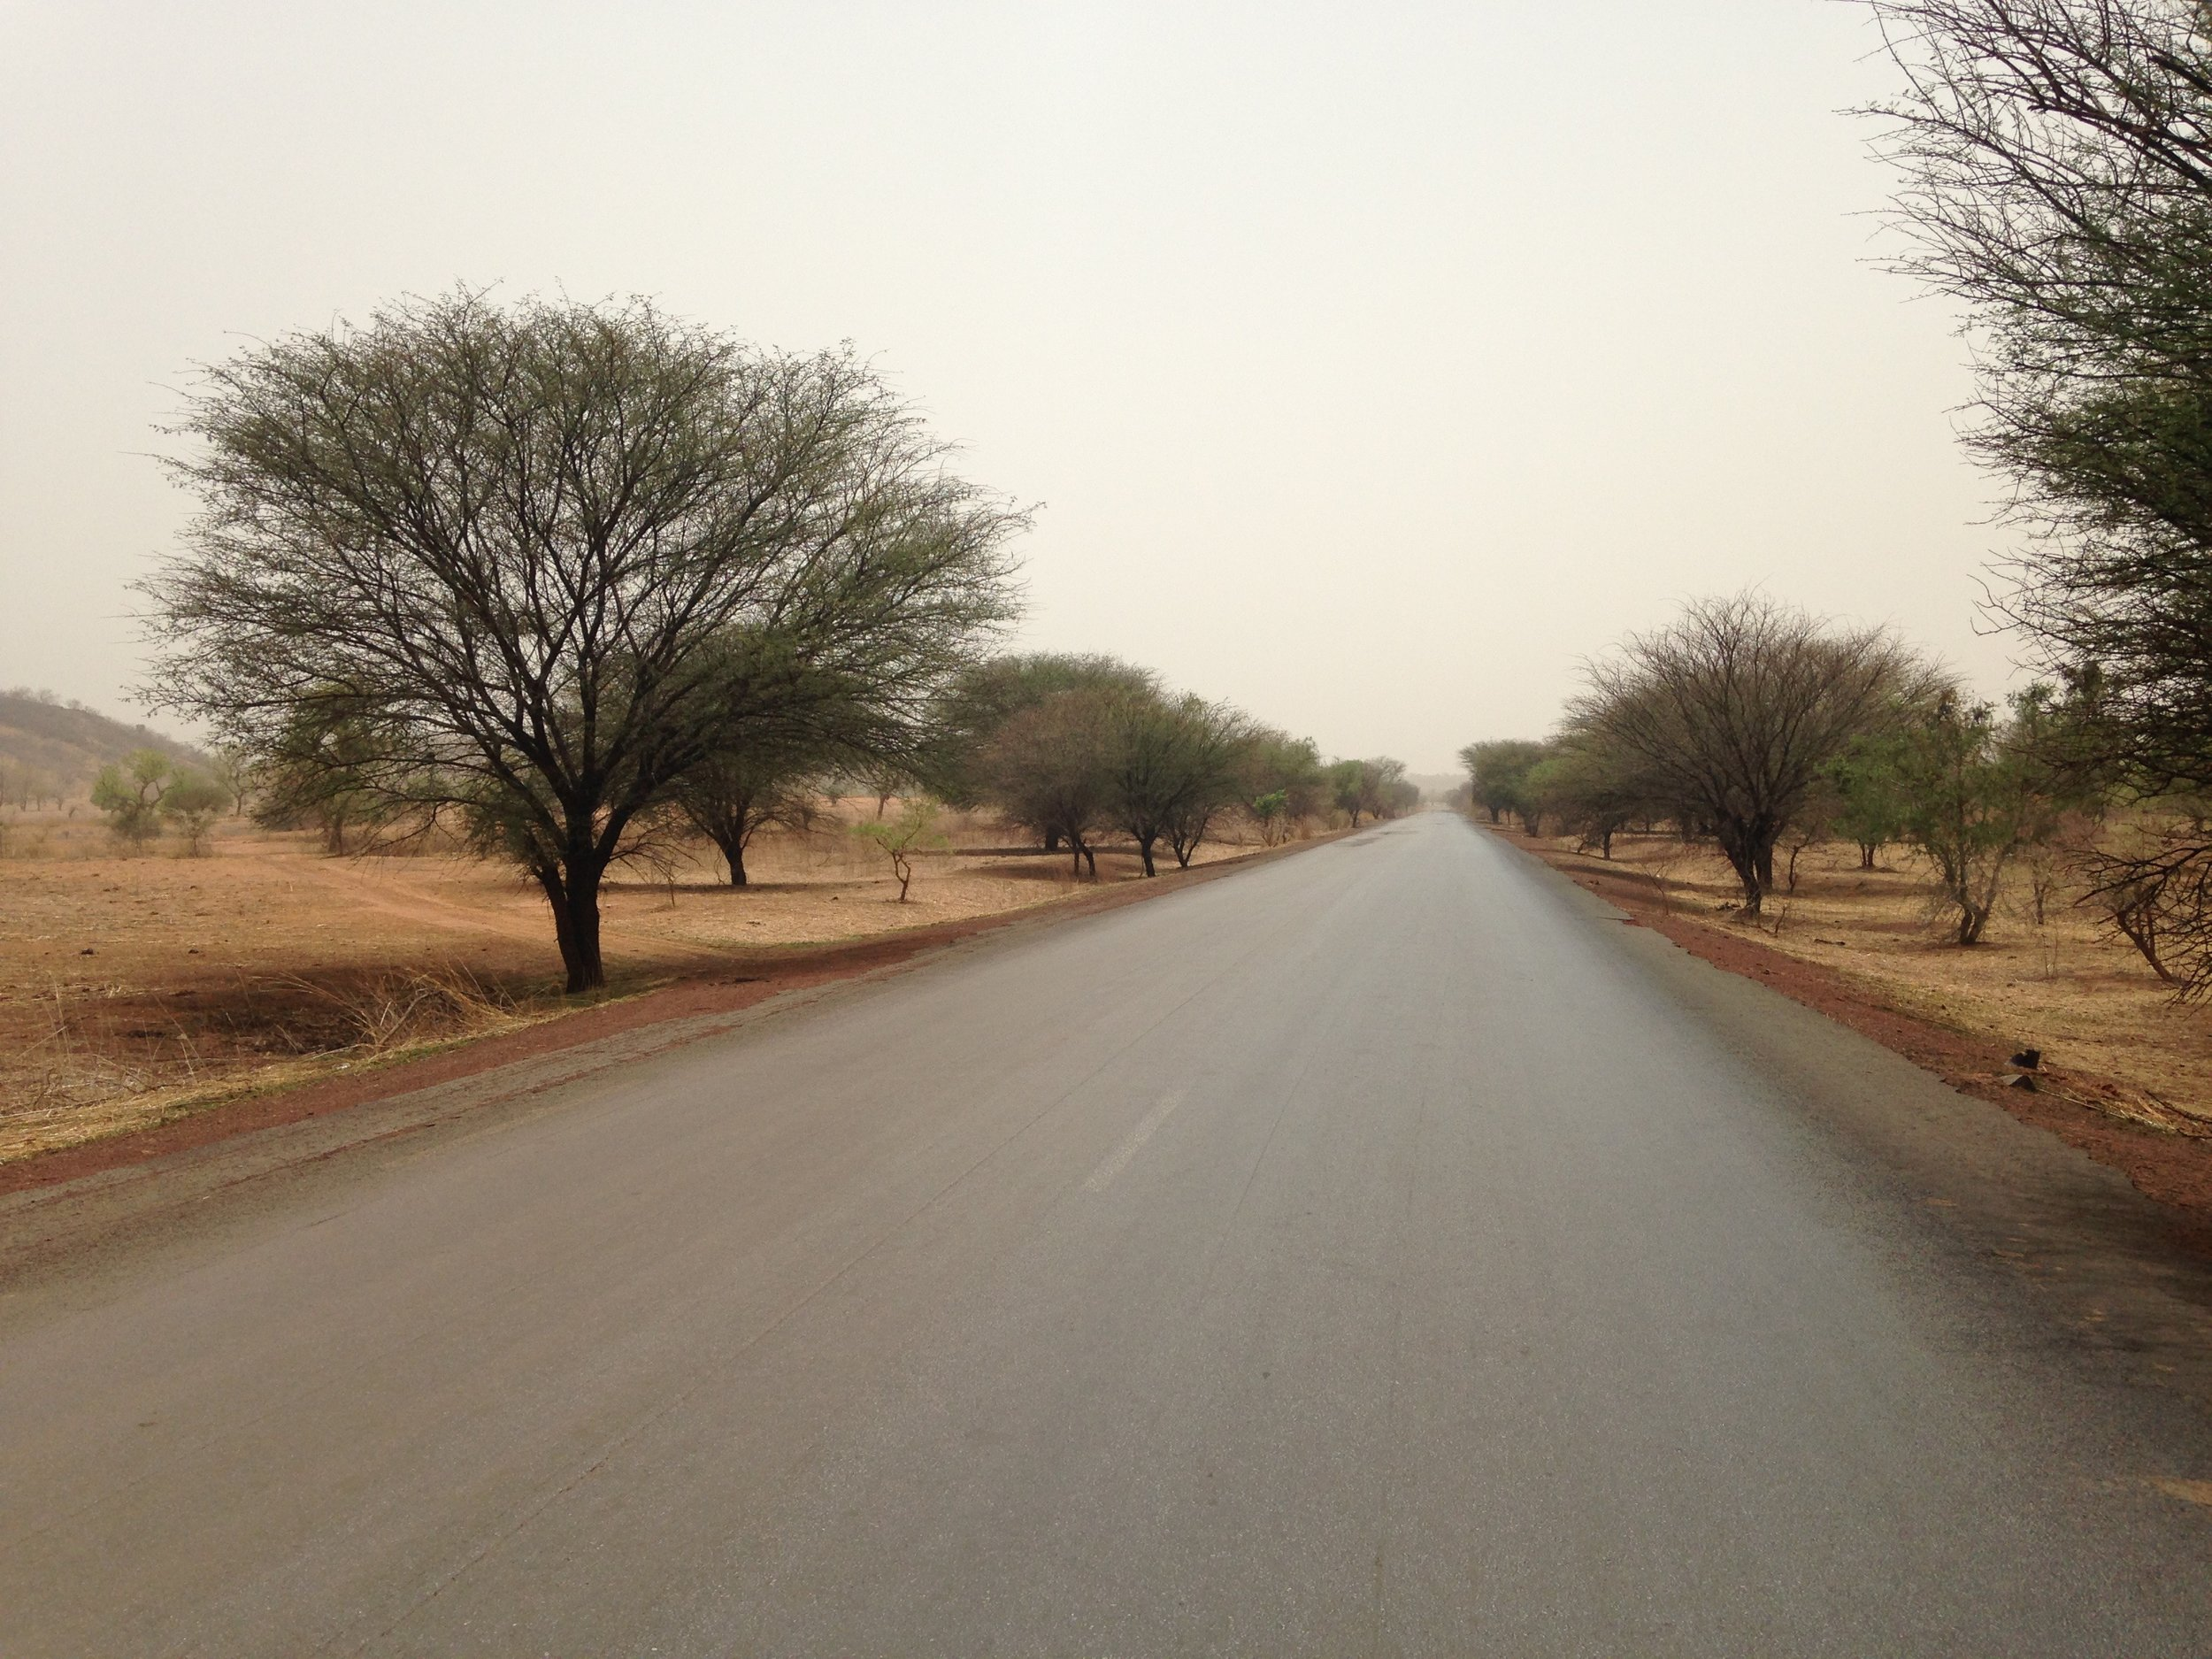 RN 1, outside of Didiéni. Mali.